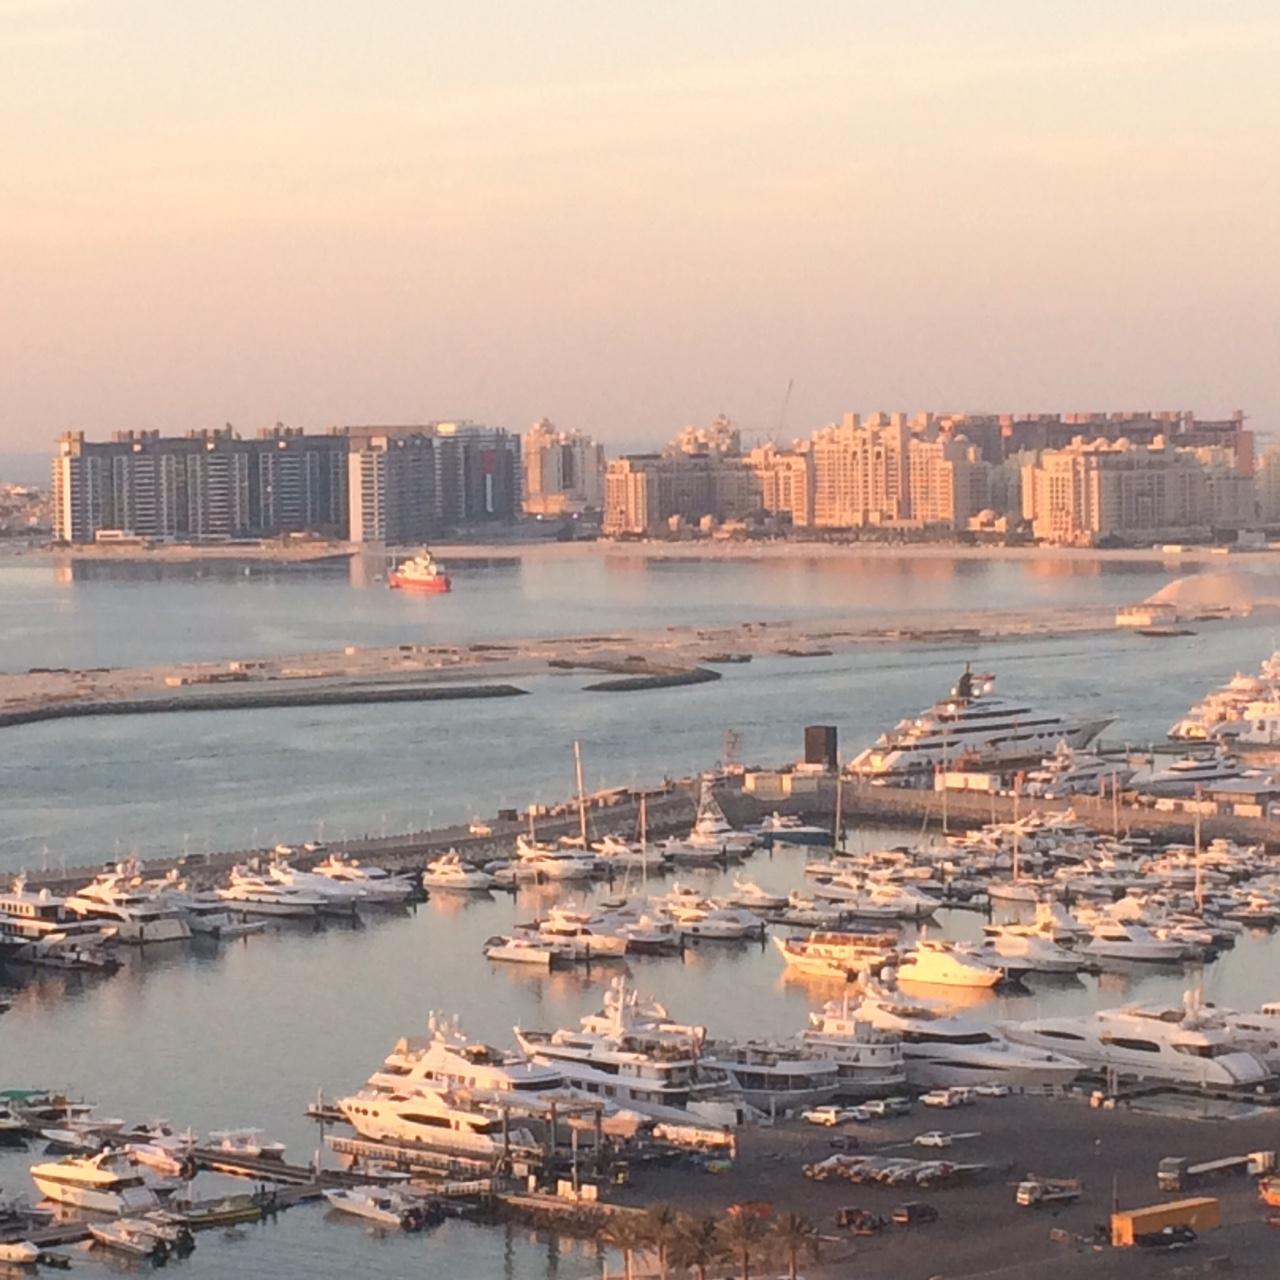 Dubai Marina, Arabia, Boats, Buildings, City, HQ Photo